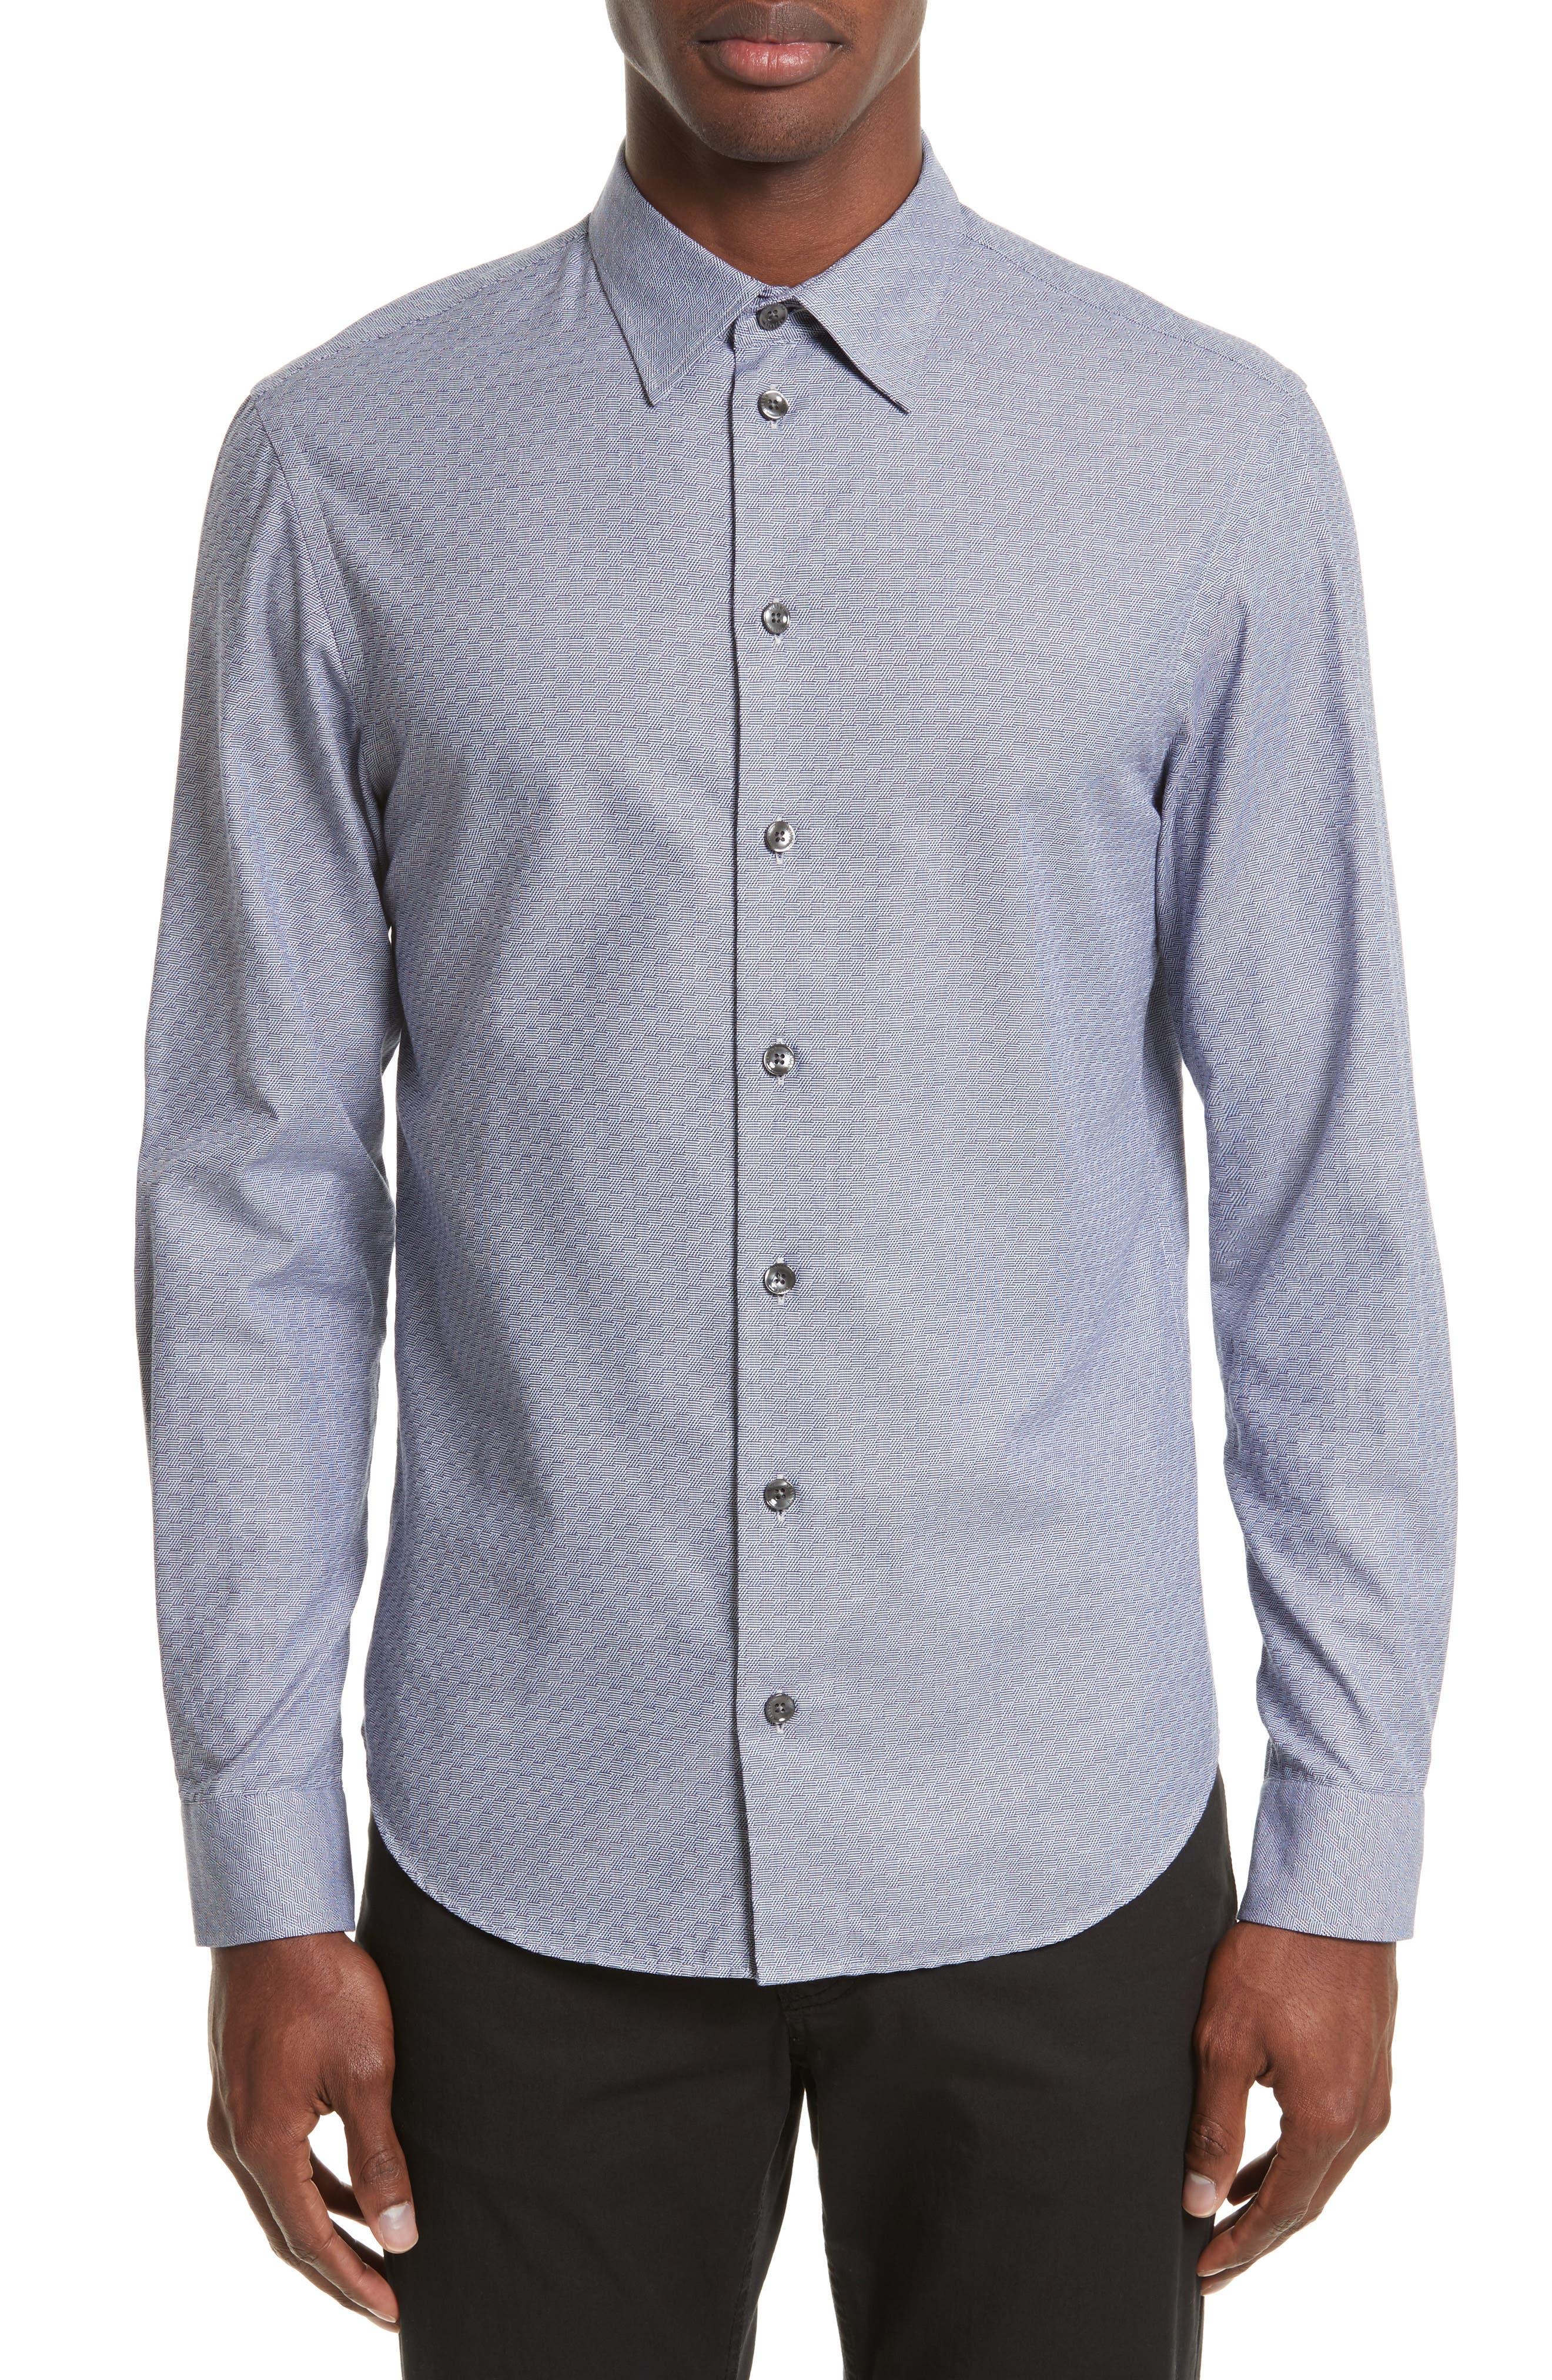 Main Image - Armani Collezioni Geo Jacquard Sport Shirt